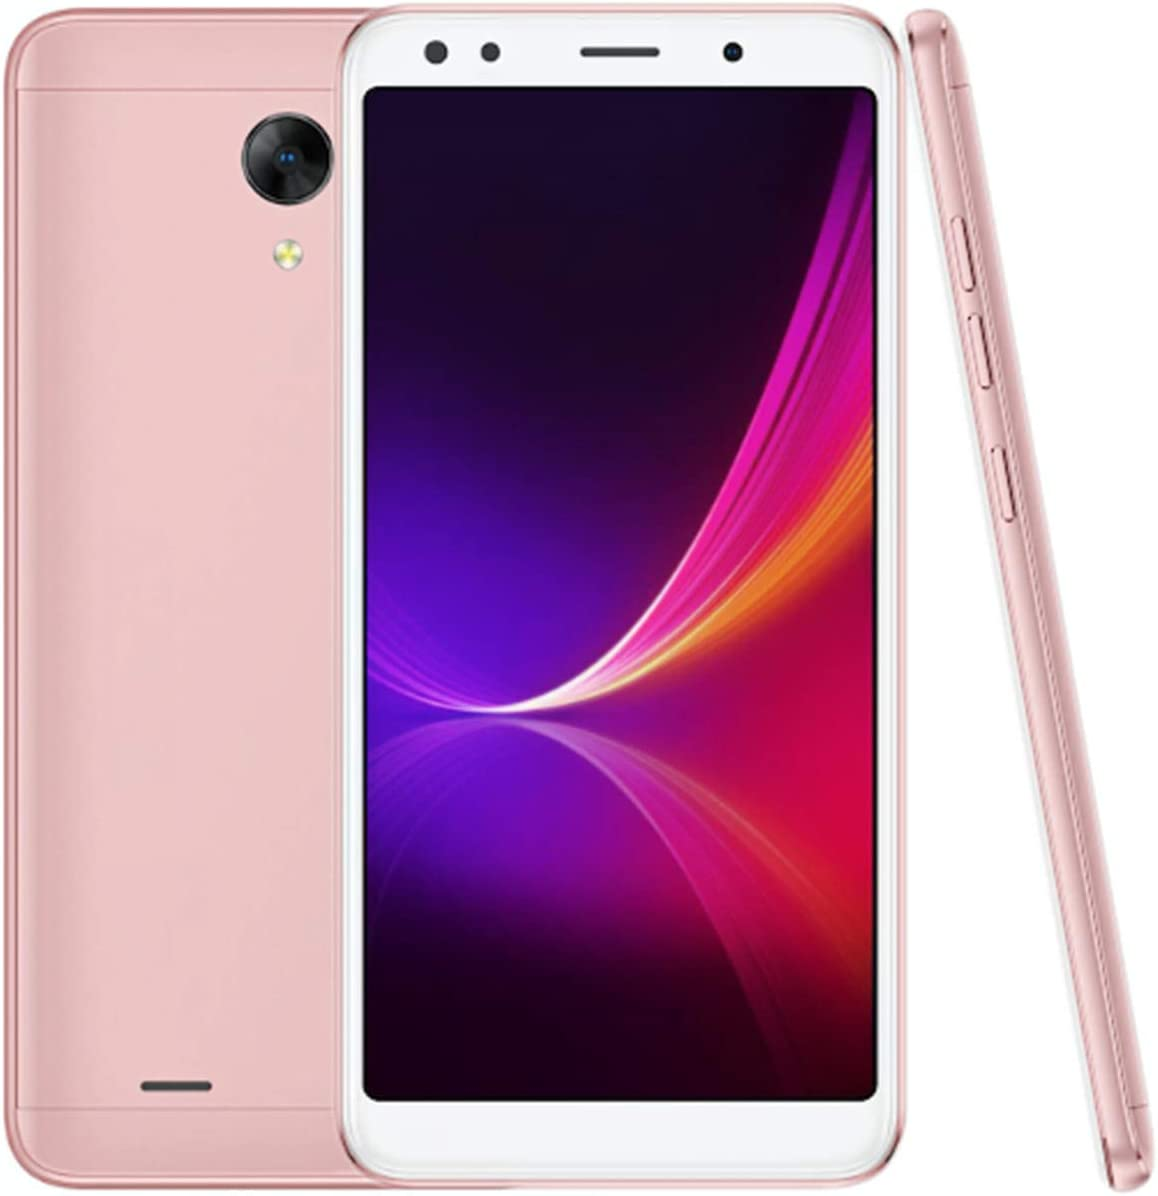 4.0 Inch Android 6.0 Smartphone 61DMbJk3OSLSL1500_